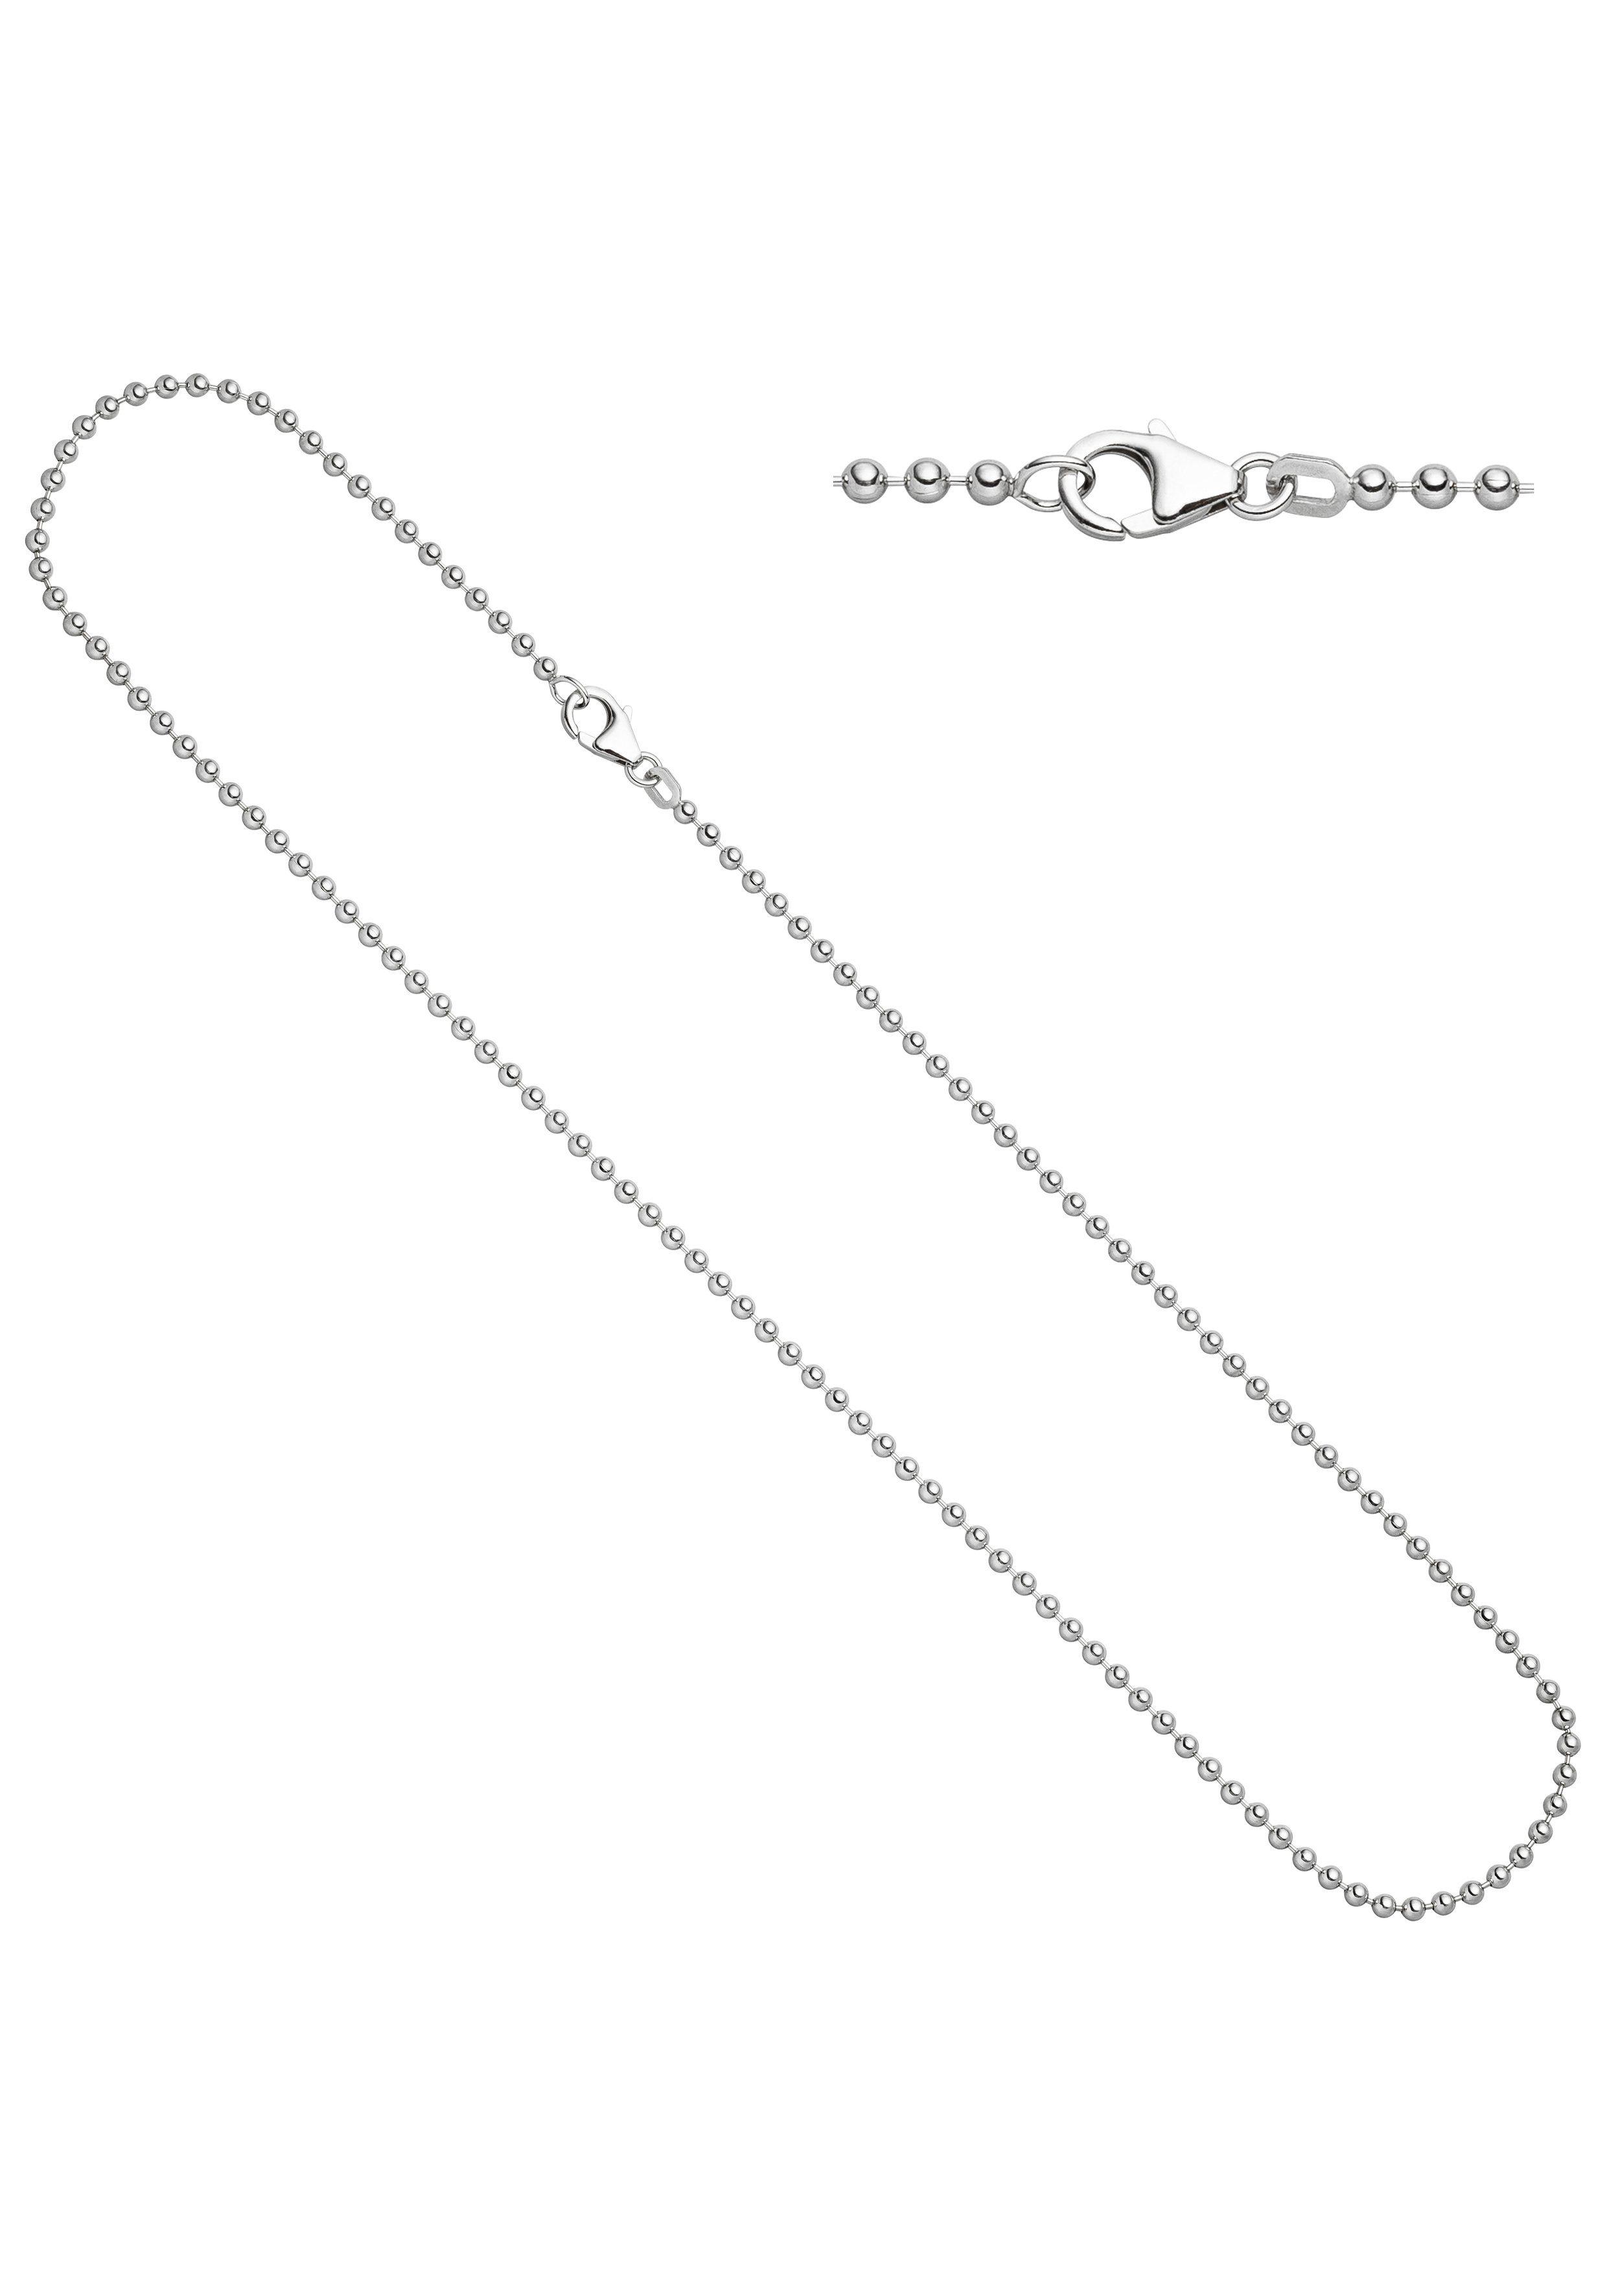 JOBO Silberkette Kugelkette 925 Silber 90 cm 2,5 mm